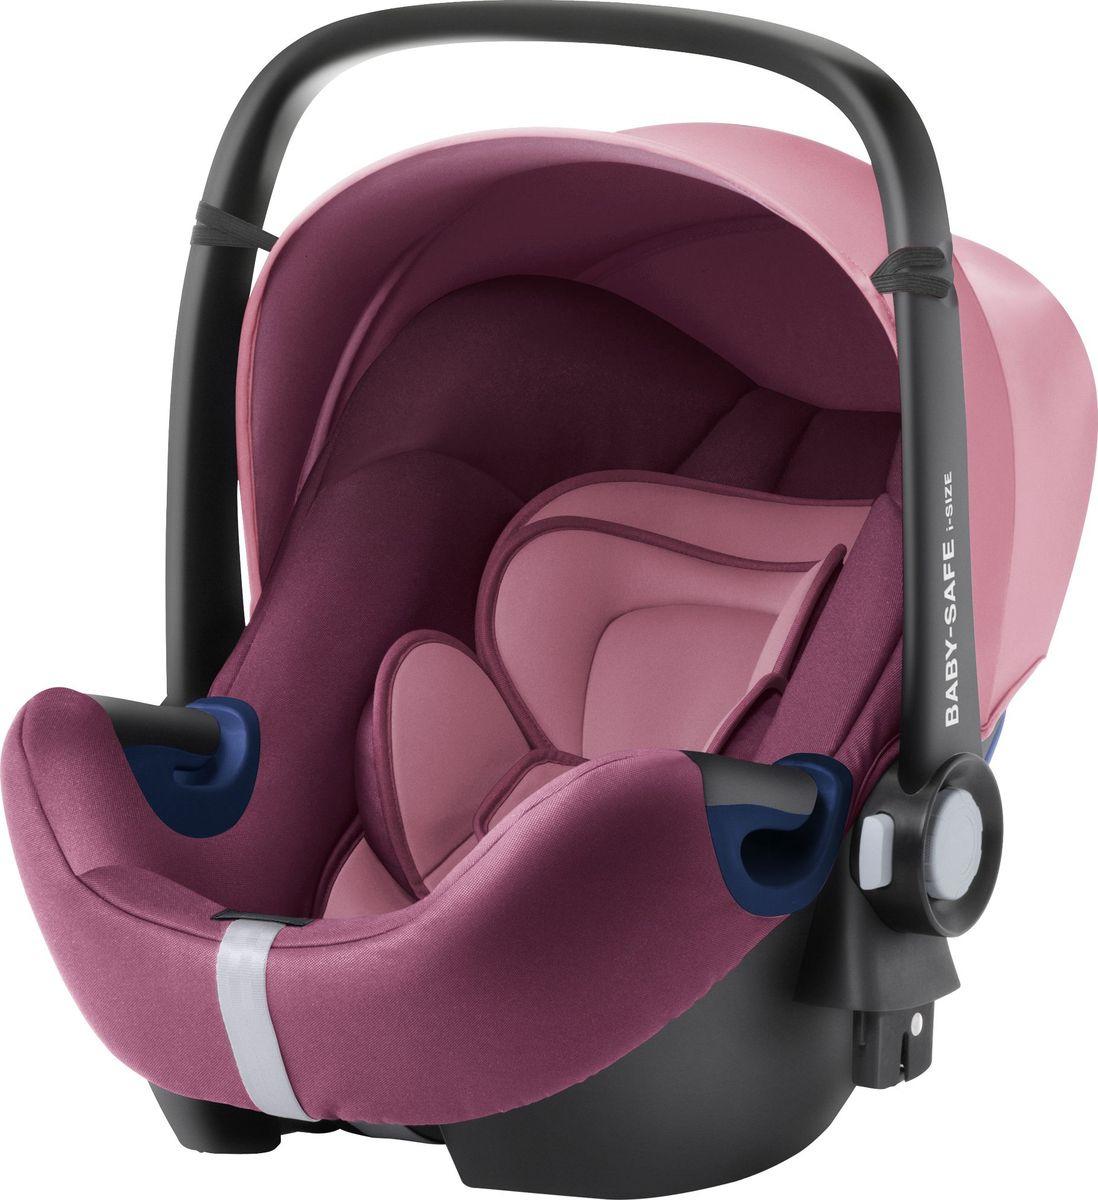 Автокресло Britax Roemer Baby-Safe2 I-Size Wine Rose Trendline, розовый детское автокресло baby safe2 i size coral peach trendline